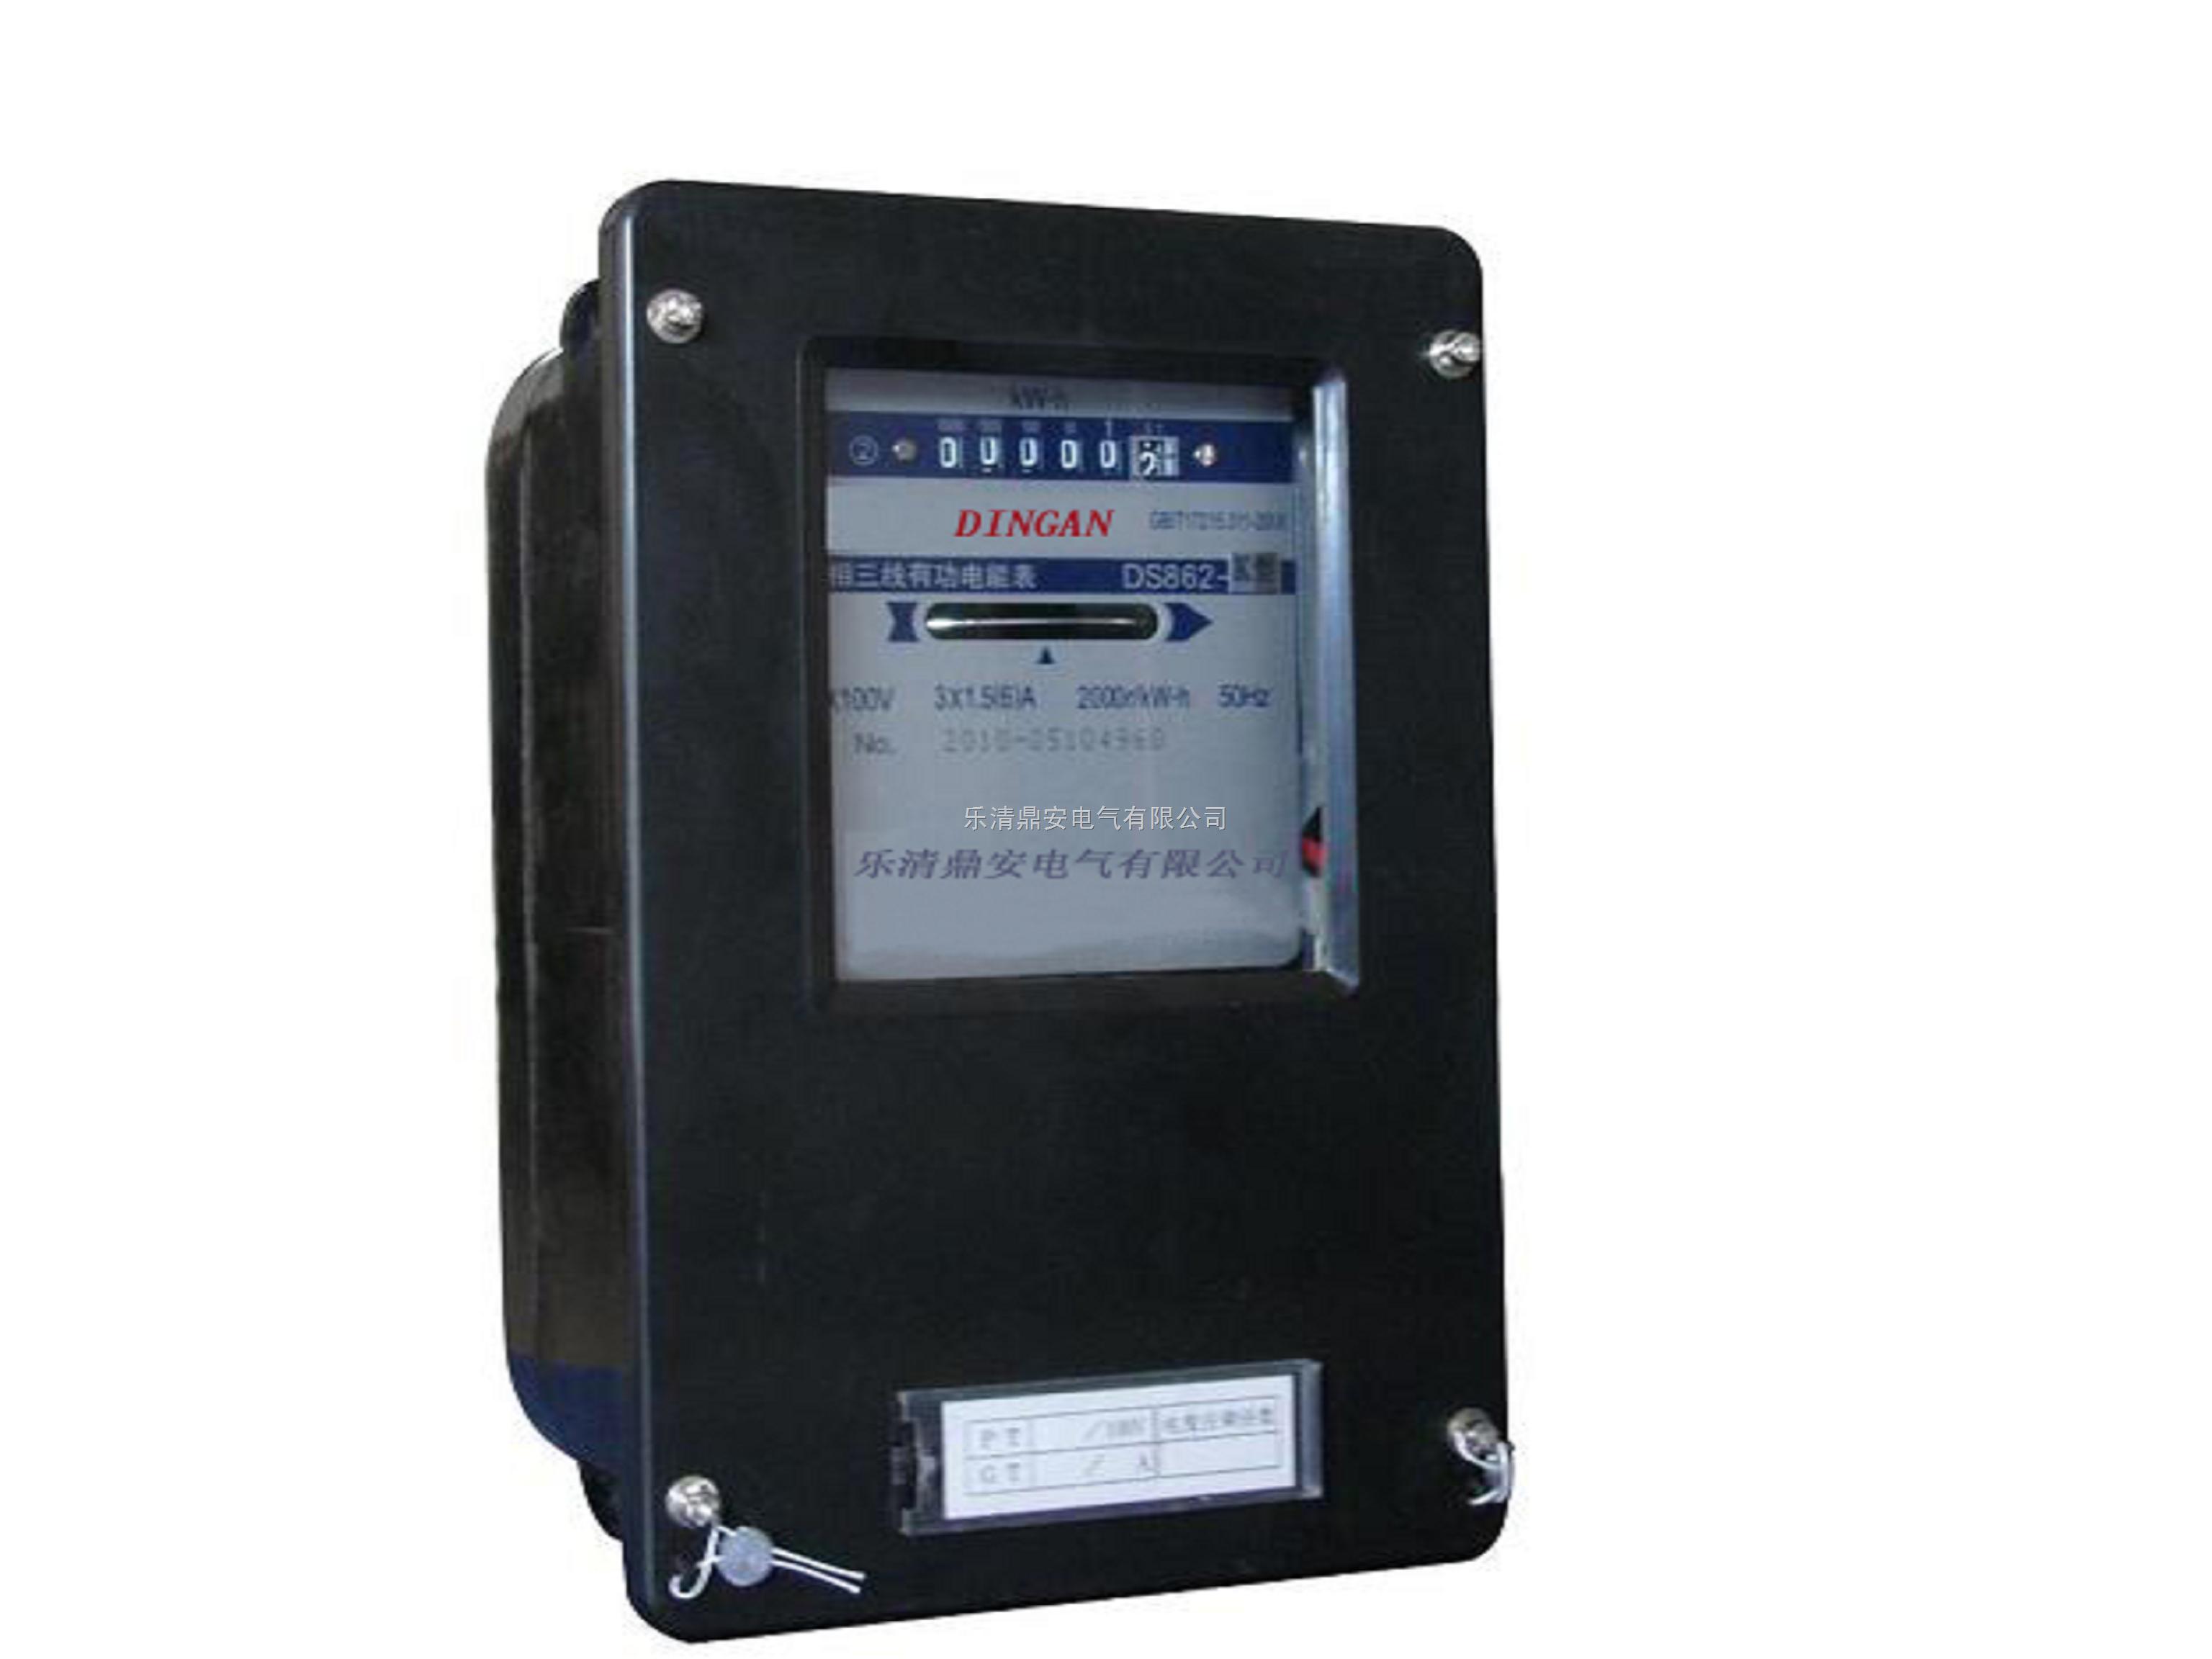 dt862-k三相四线嵌入式有功电能表